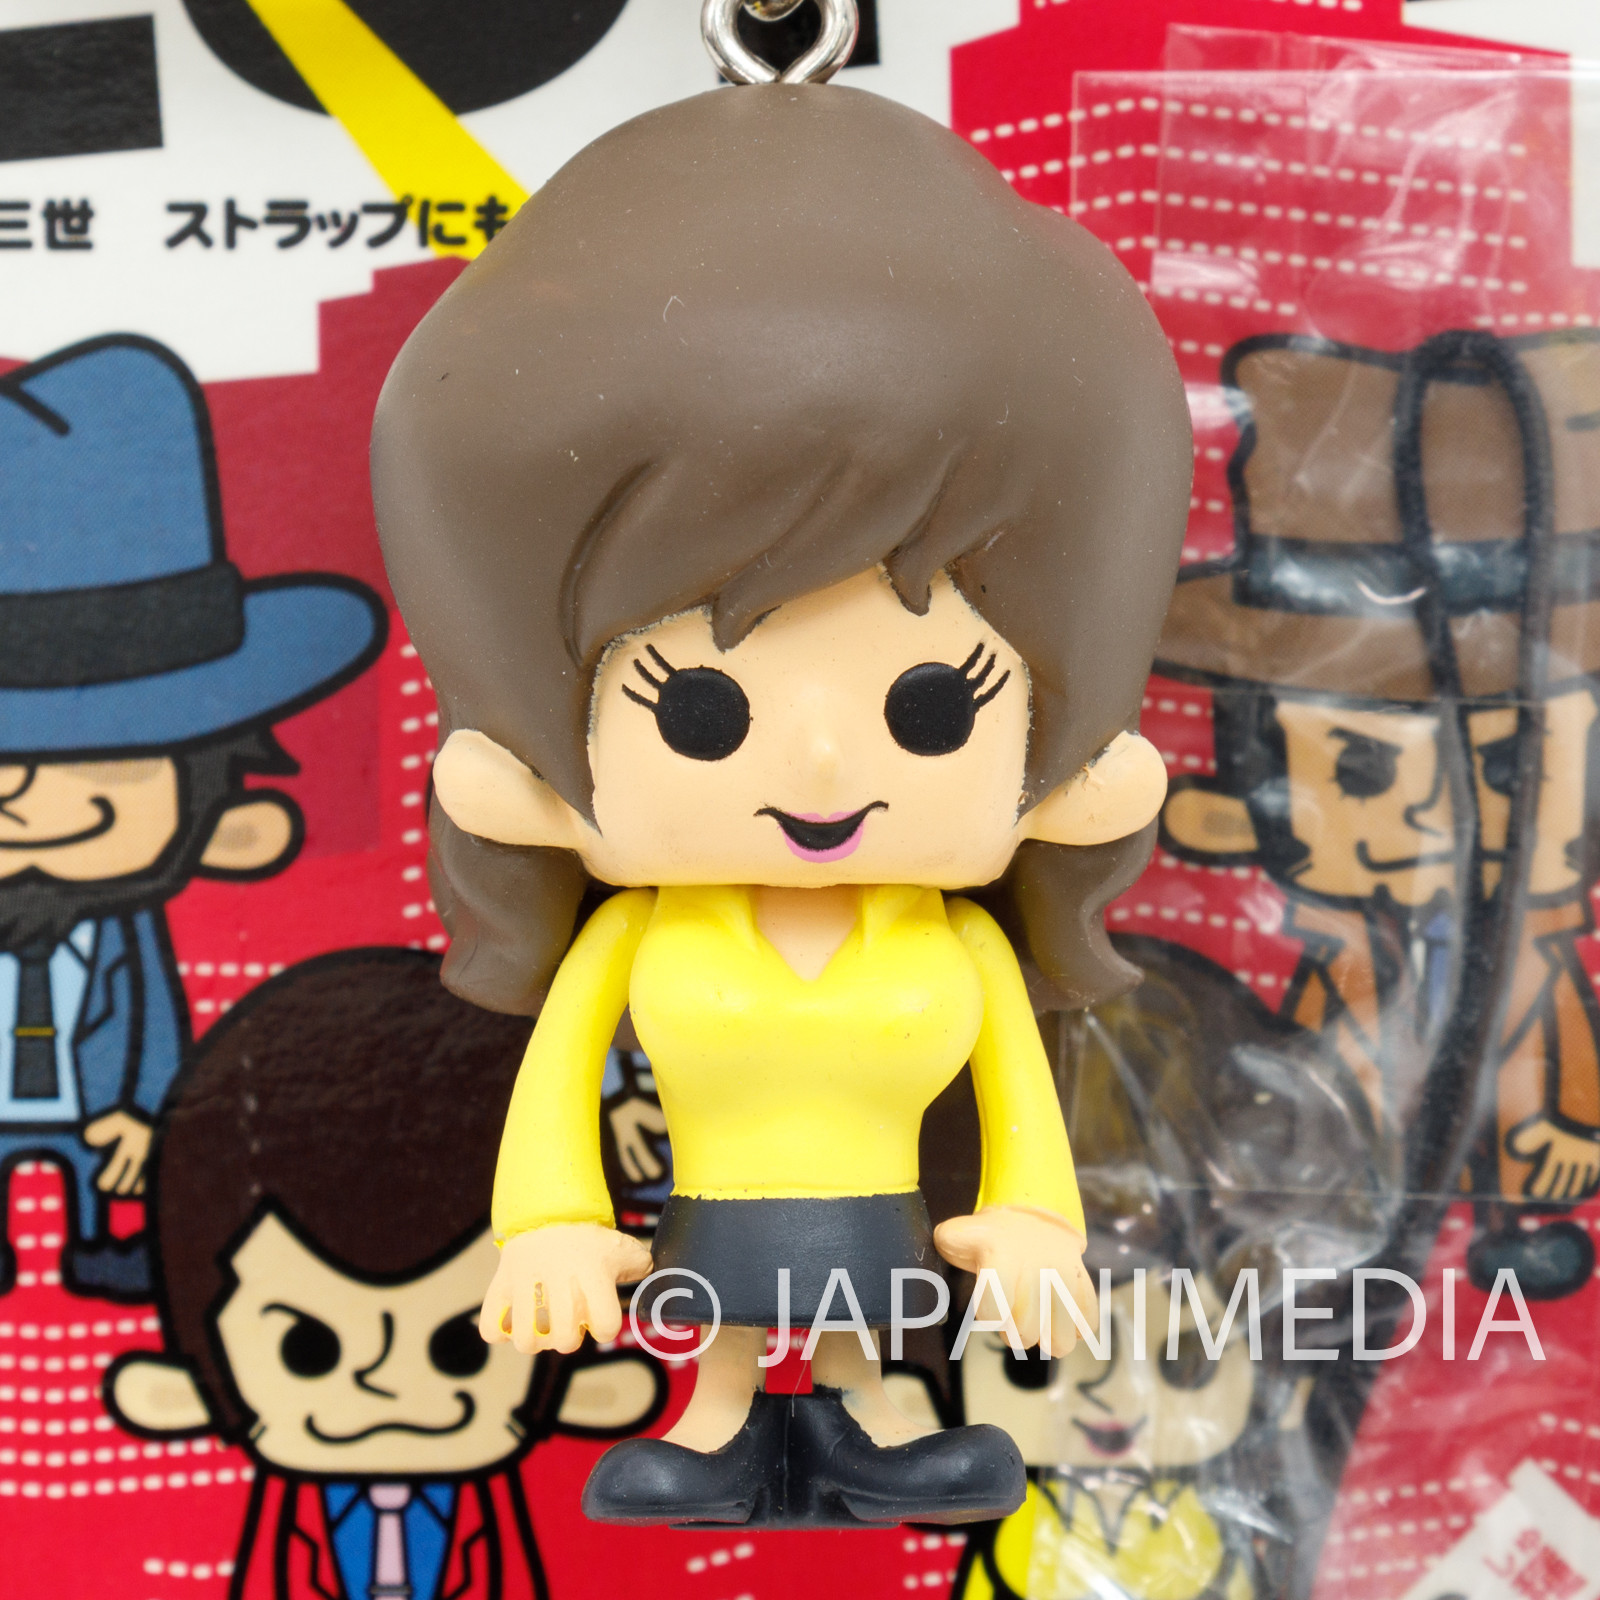 Lupin the 3rd x Panson Works Figure Keychain Fujiko Mine Banpresto THIRD